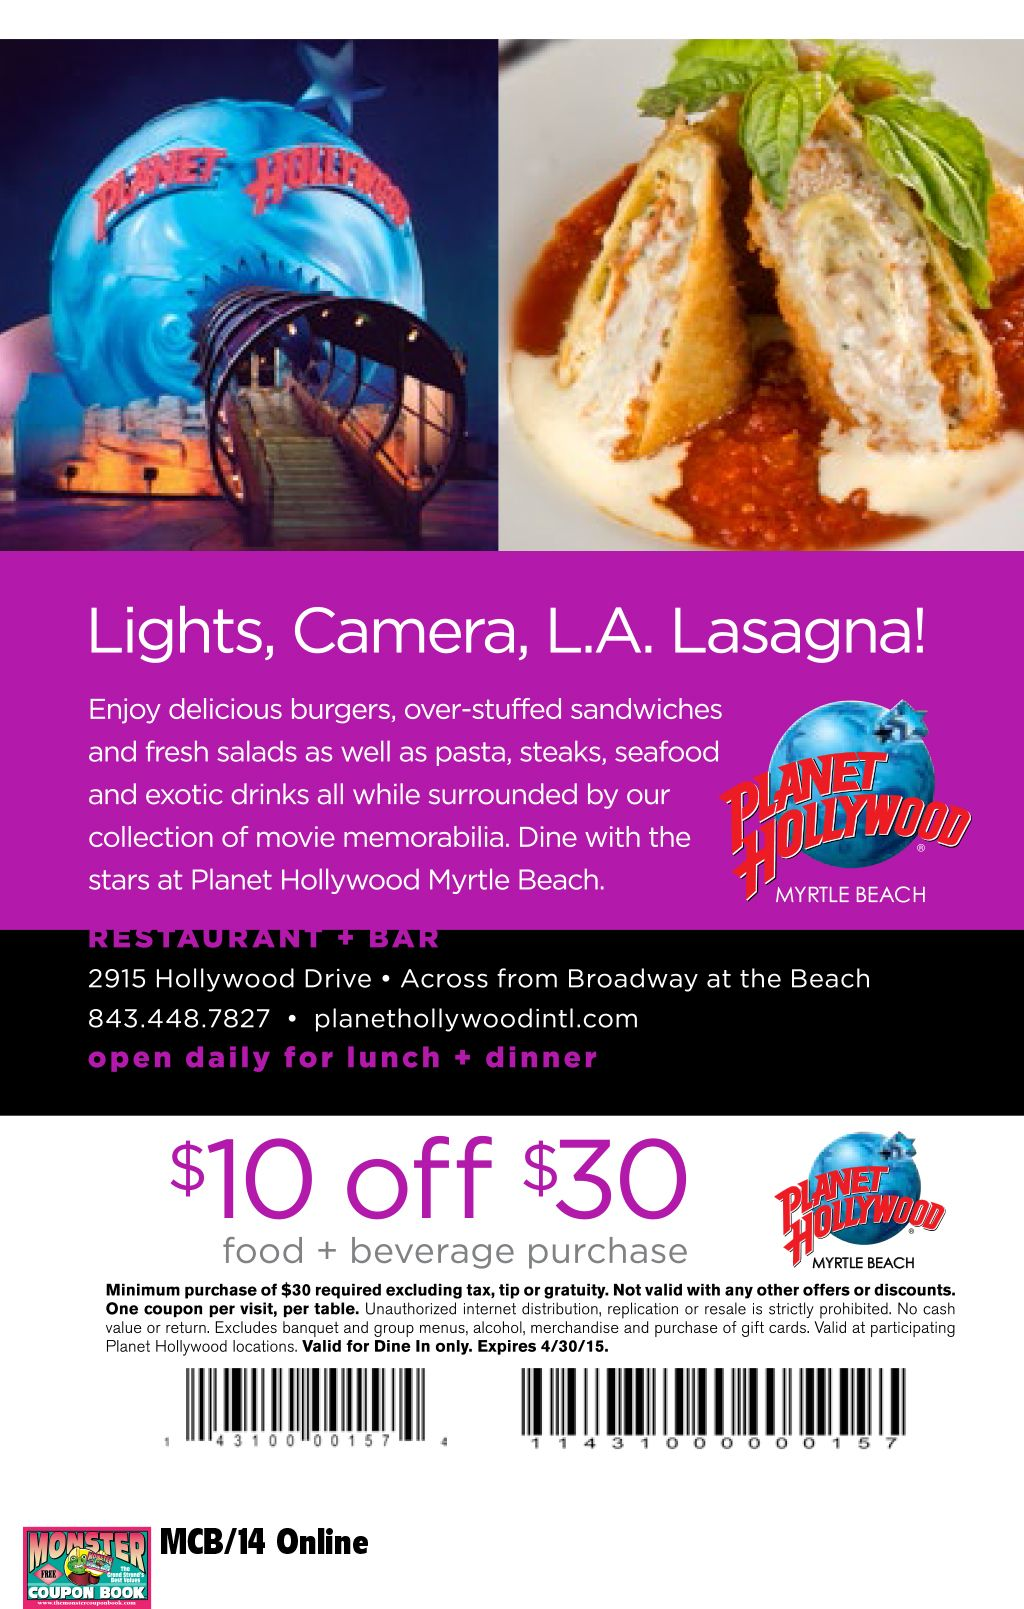 Hollywood restaurant bar myrtle beach resorts